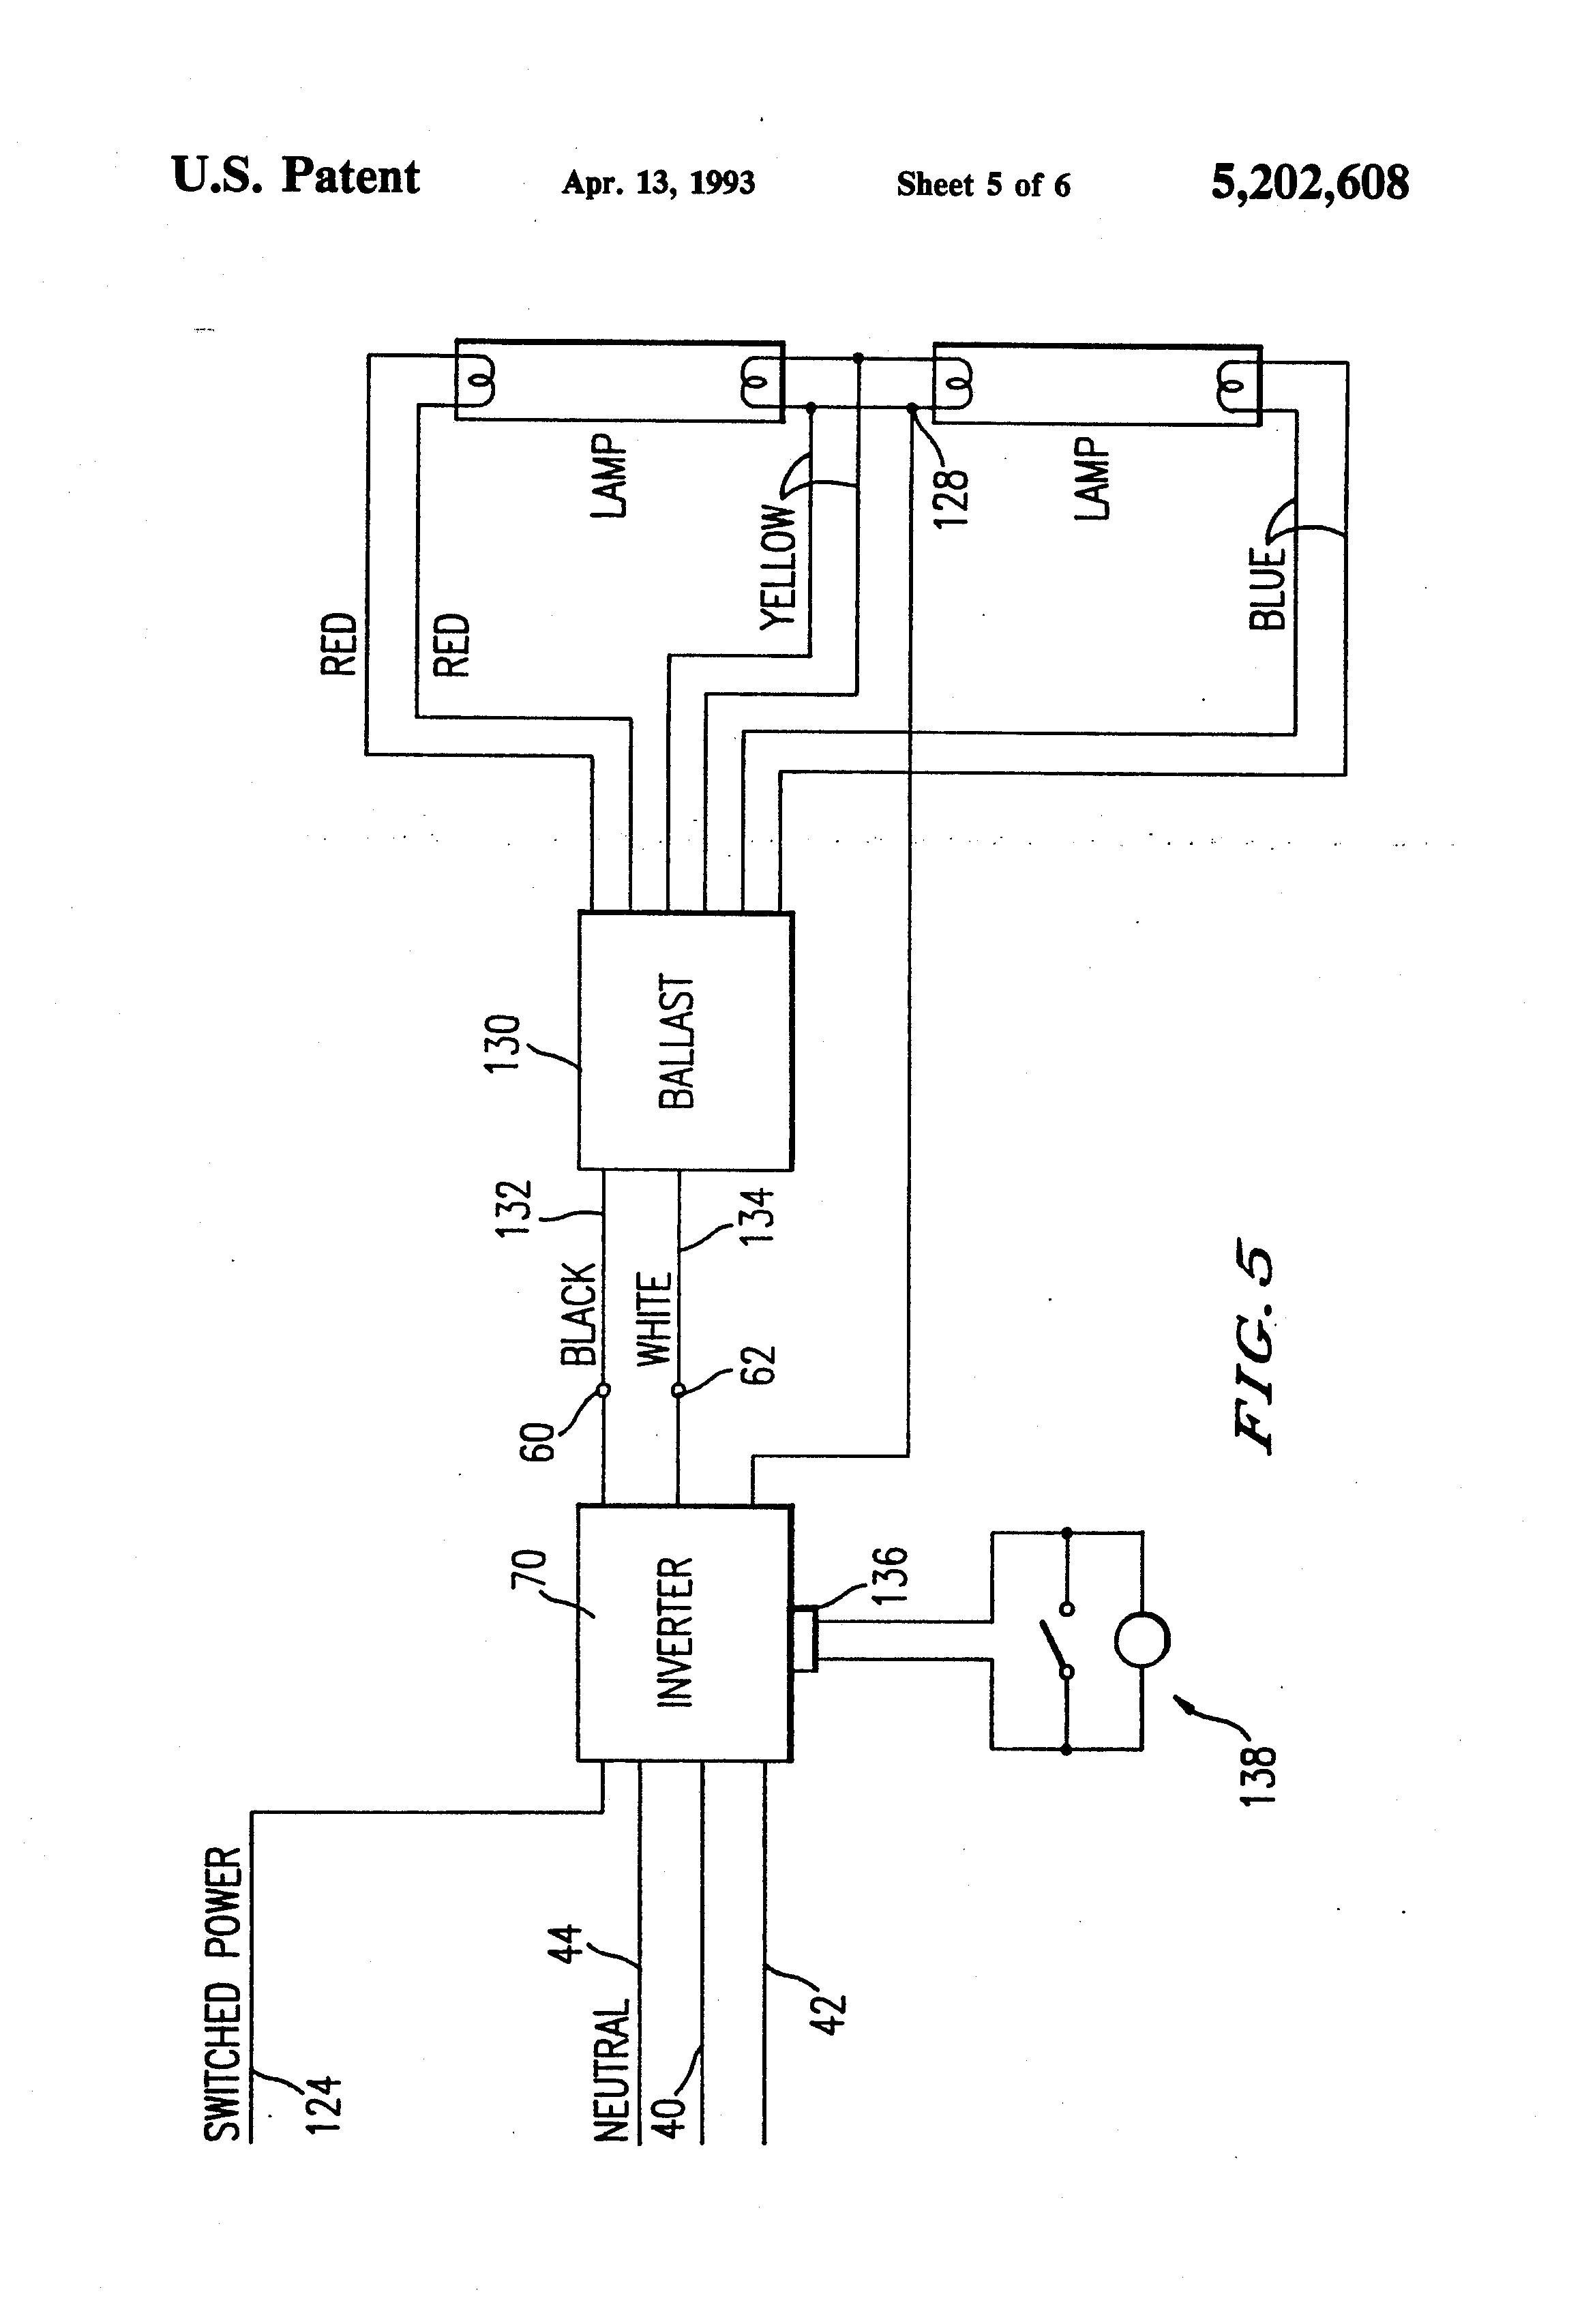 Bodine Ballast Wiring Diagram Duratec Hid Ballast Wiring Diagram Wiring Diagram Fascinating